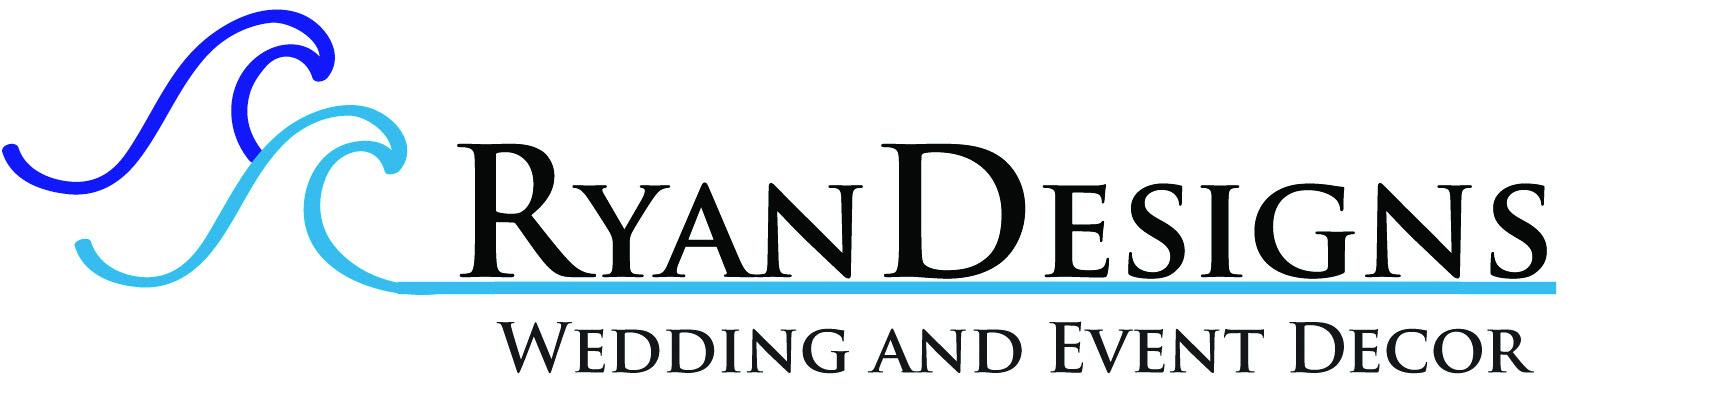 Ryan Designs Logo